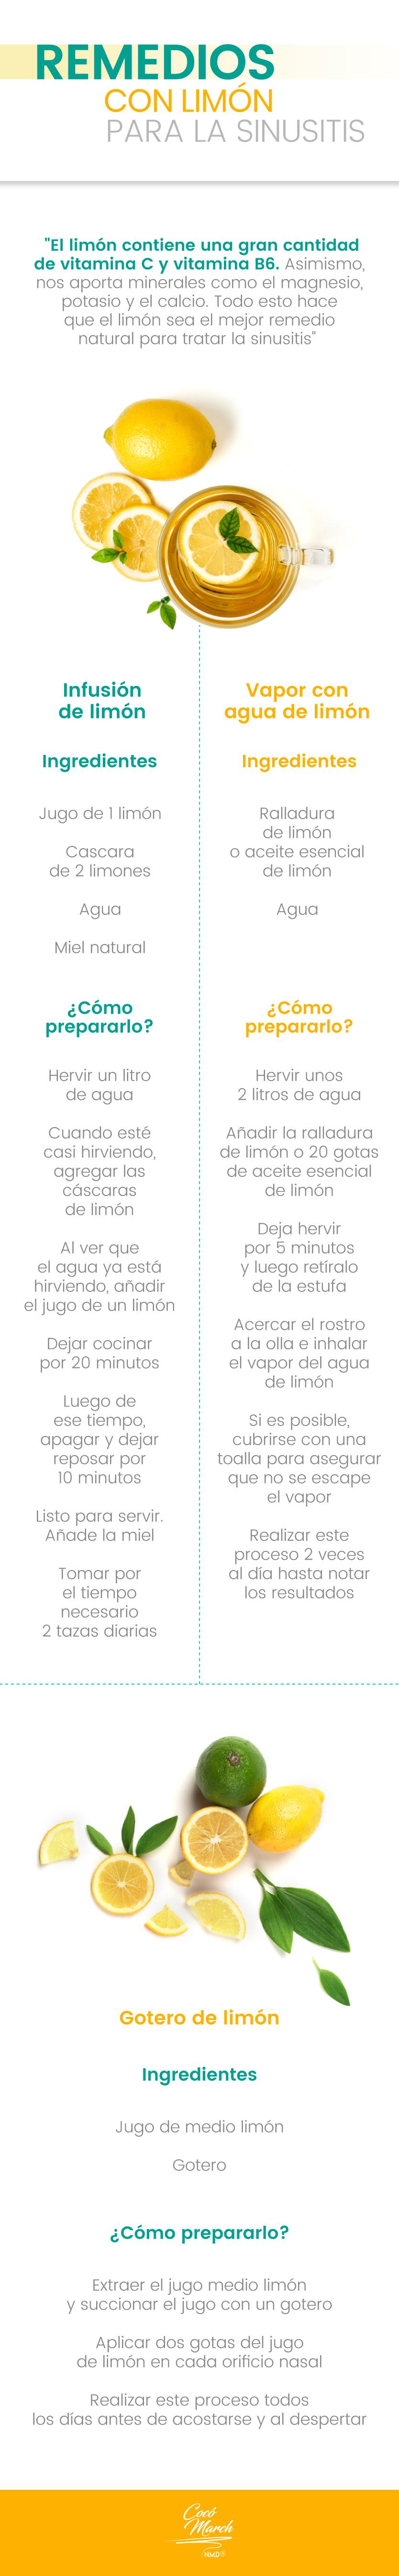 remedios-con-limon-para-la-sinusitis